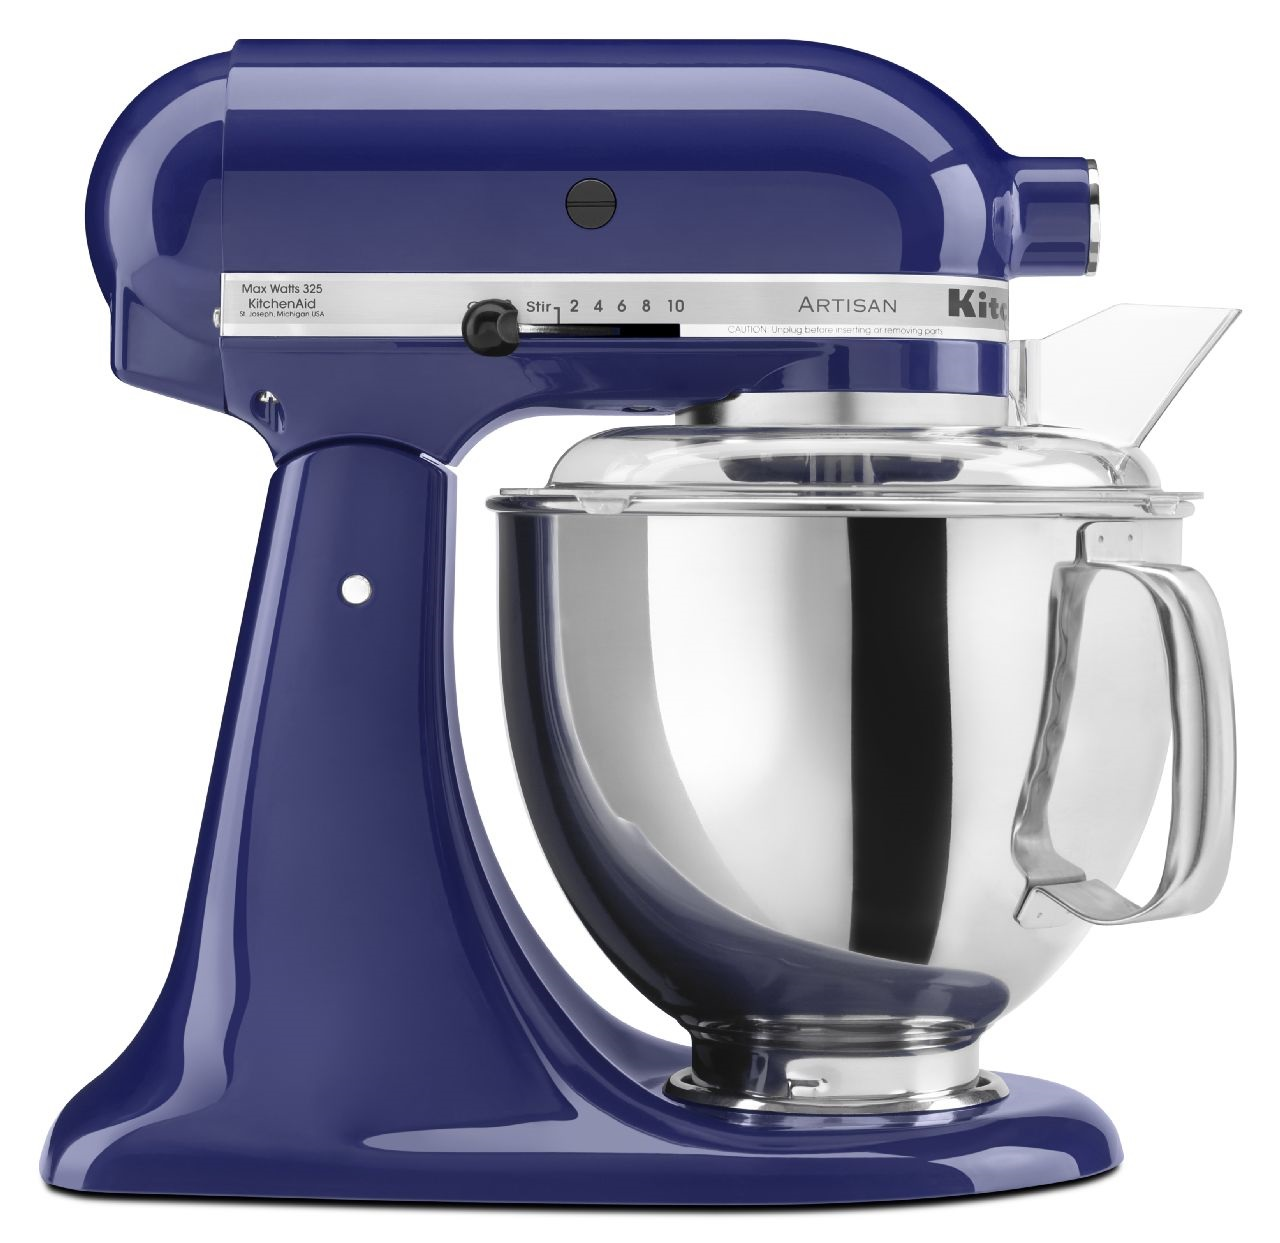 KitchenAid® Artisan® Series 5 Qt. Tilt Head Stand Mixer